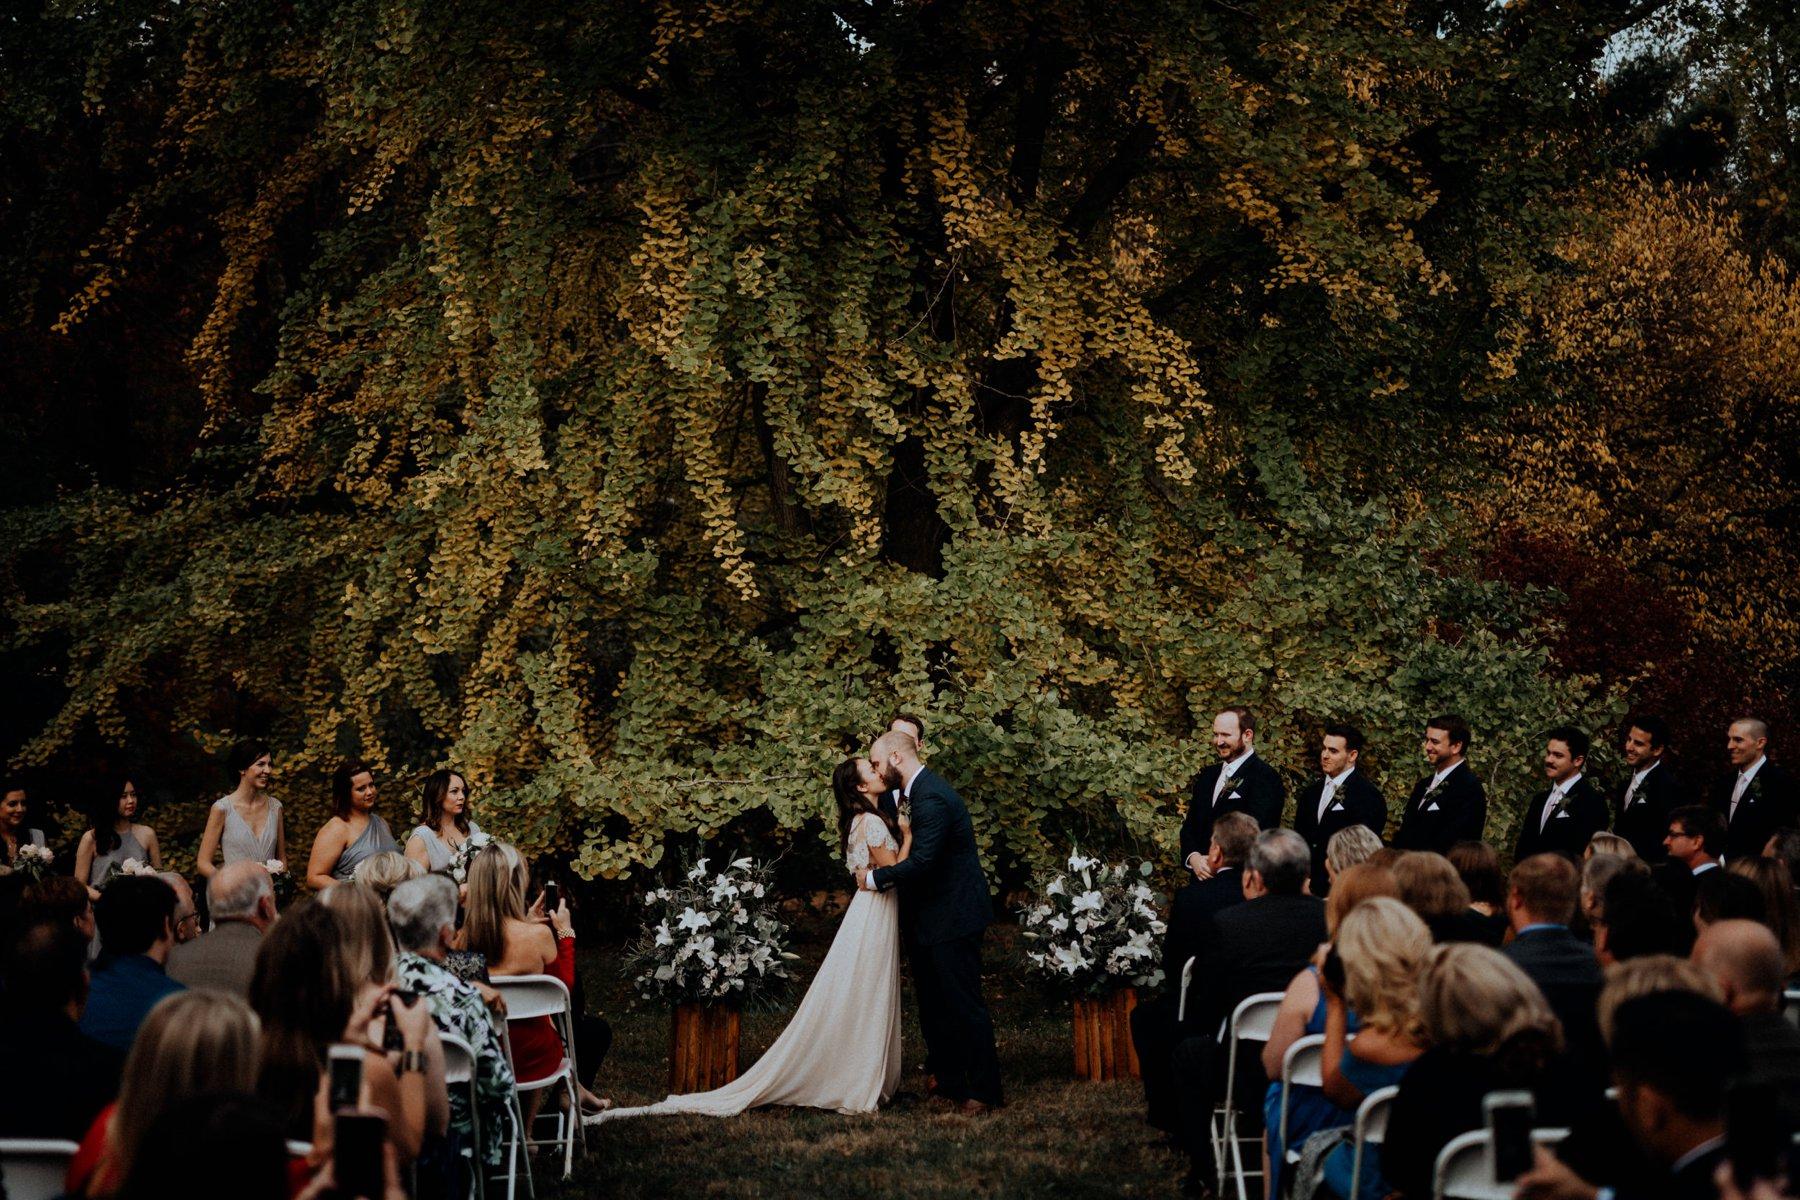 009-024-tyler-arboretum-wedding-21.jpg